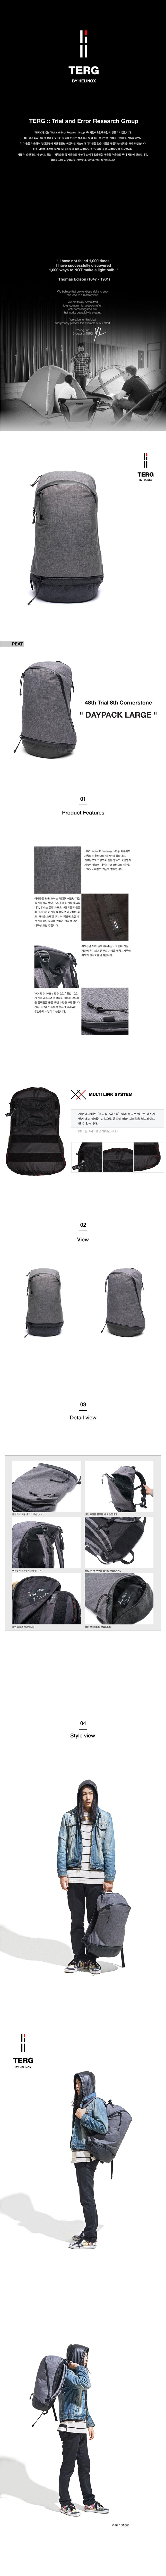 20160429_Daypack-Large-peat.jpg